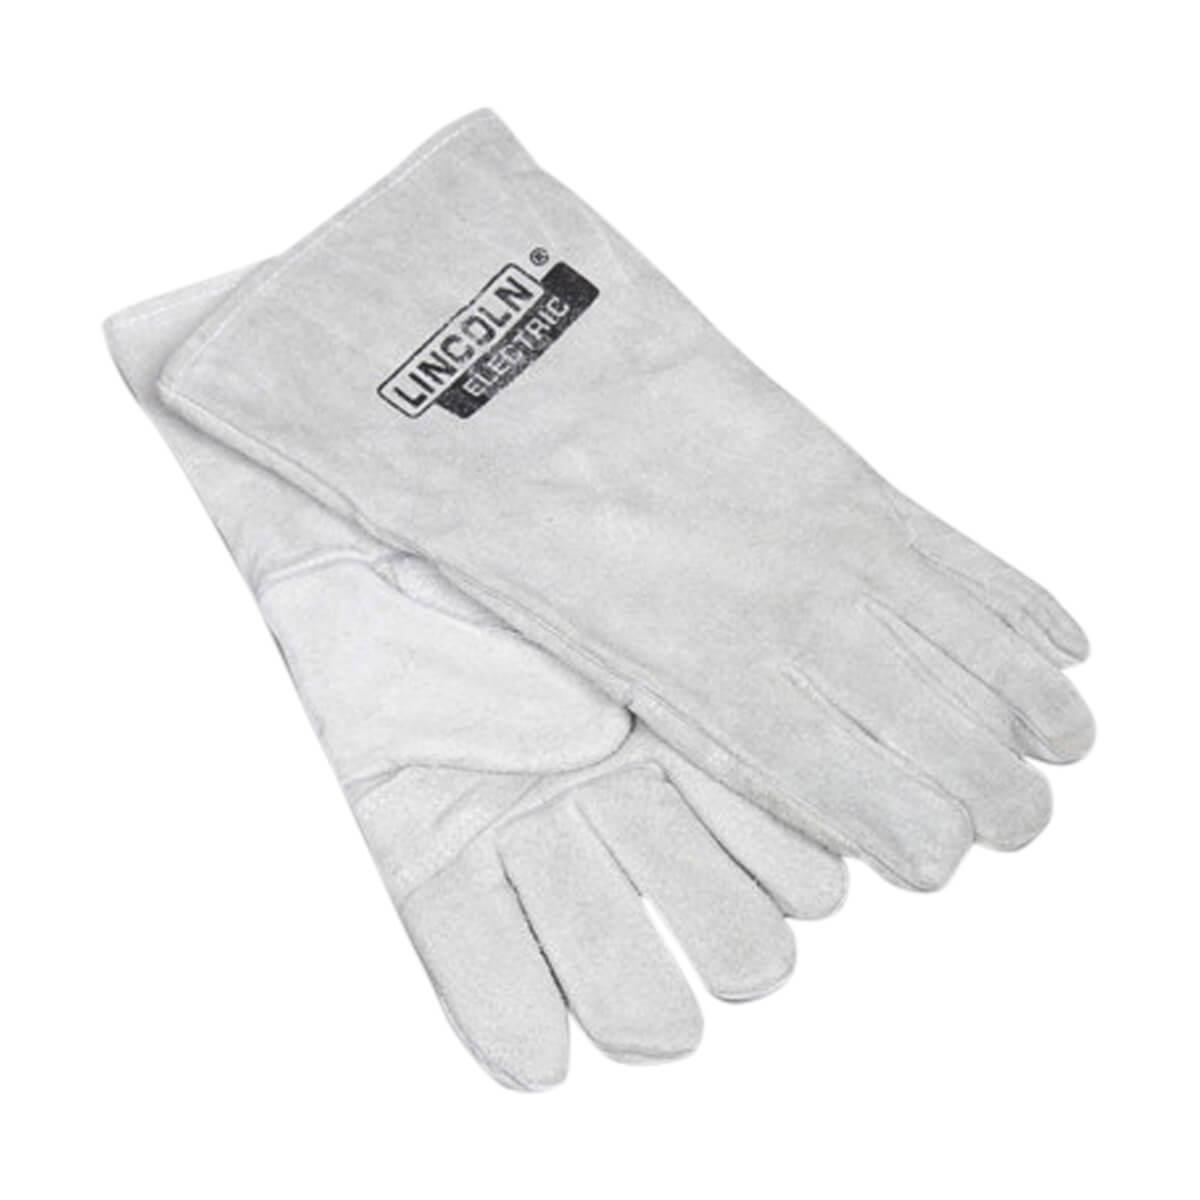 "Lincoln 14"" Grey Welding Glove"